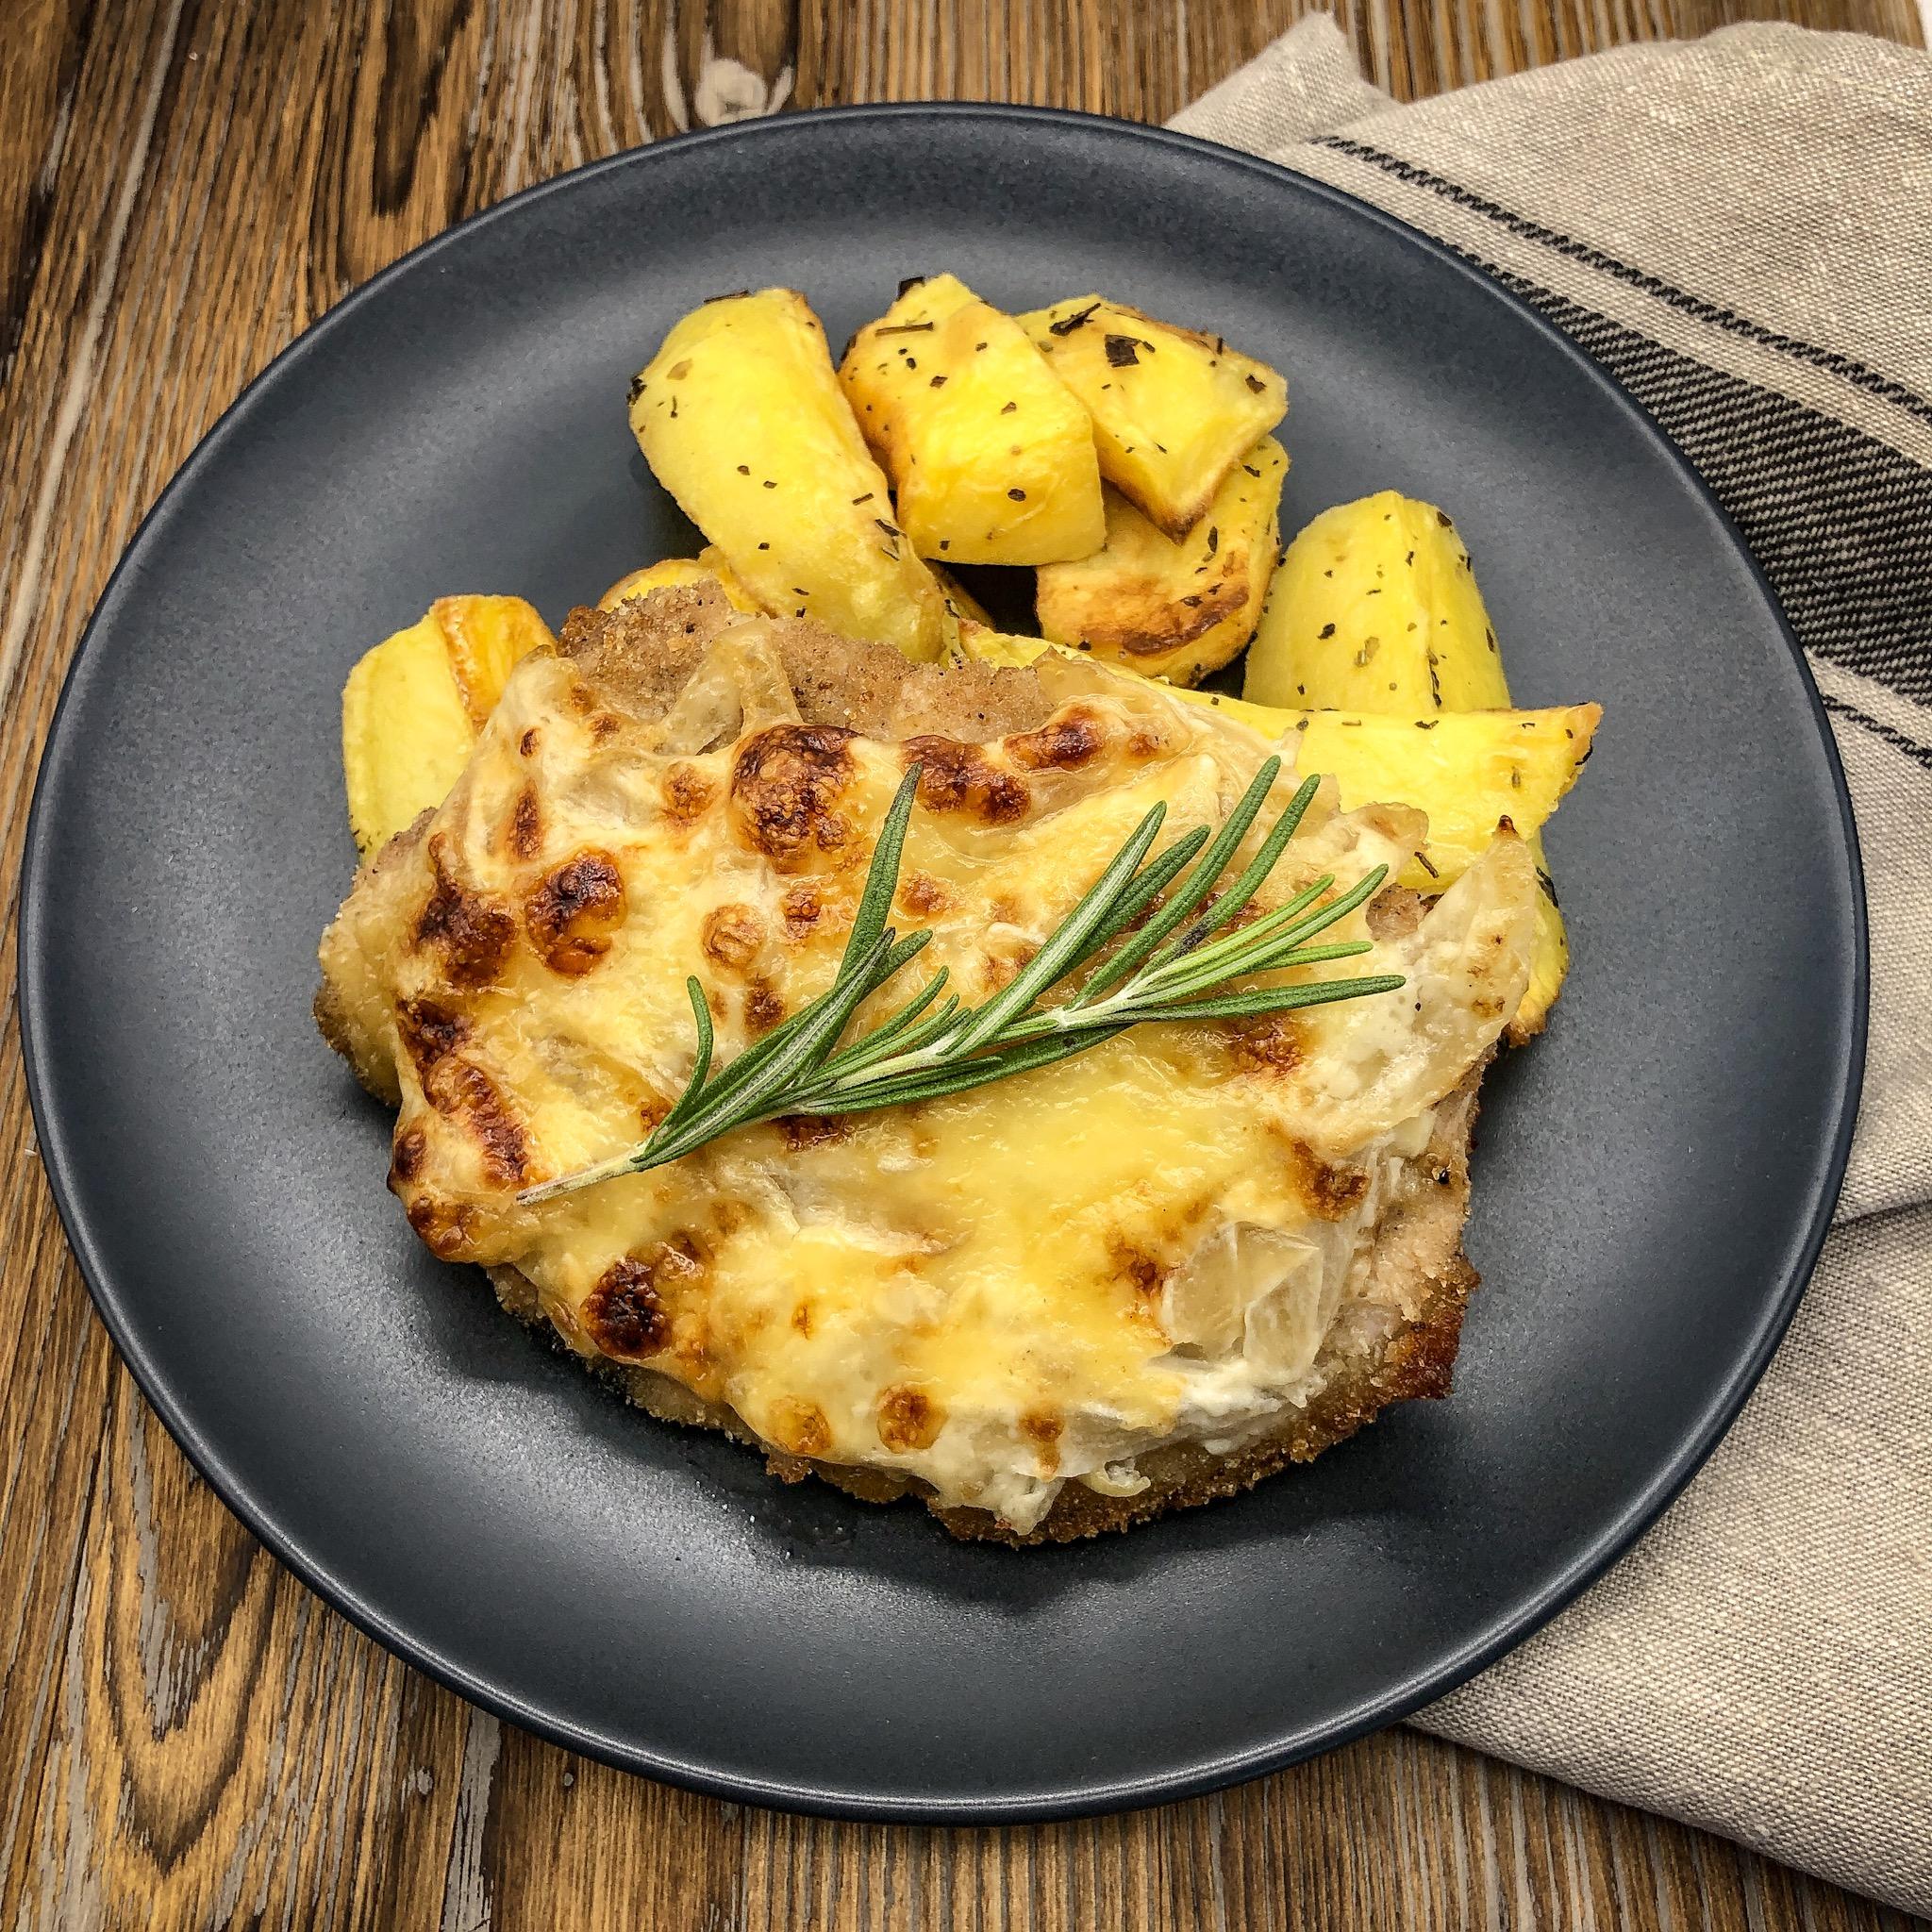 центре мясо по французскому с картошкой фото читаю